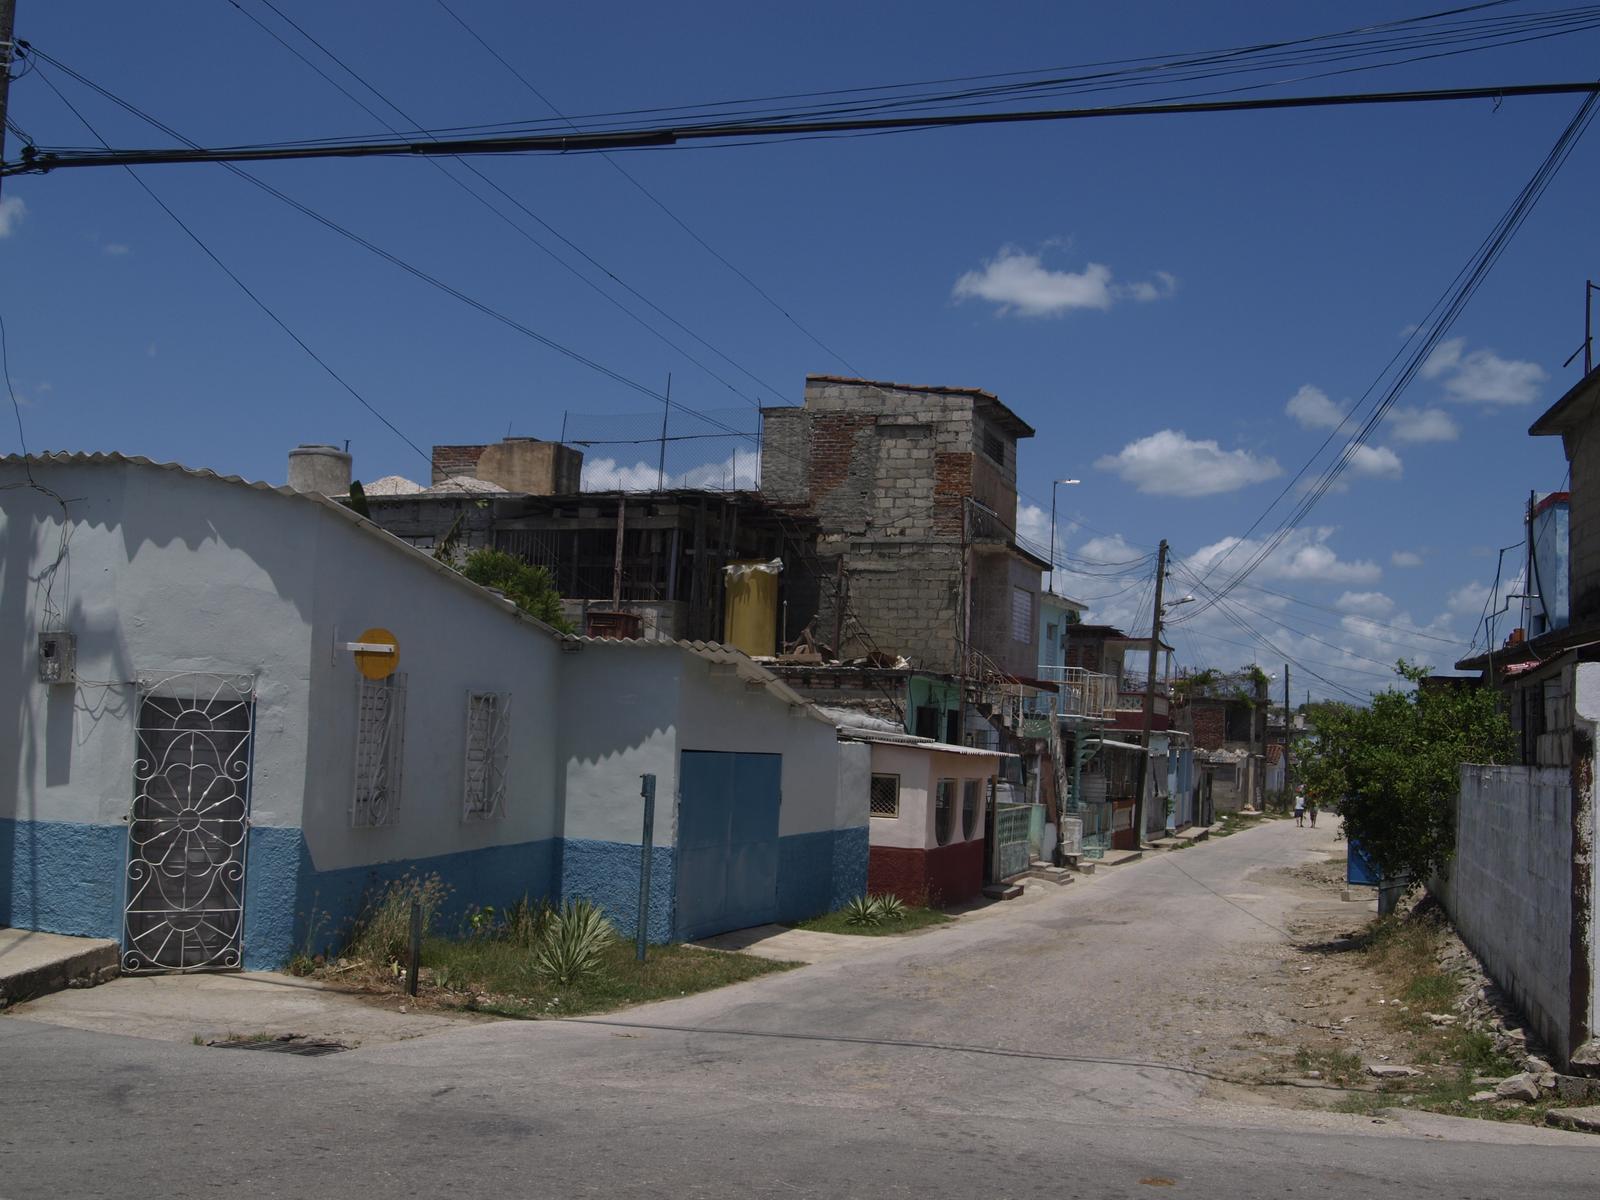 Kuba architektúra - tam kde turista nechodí